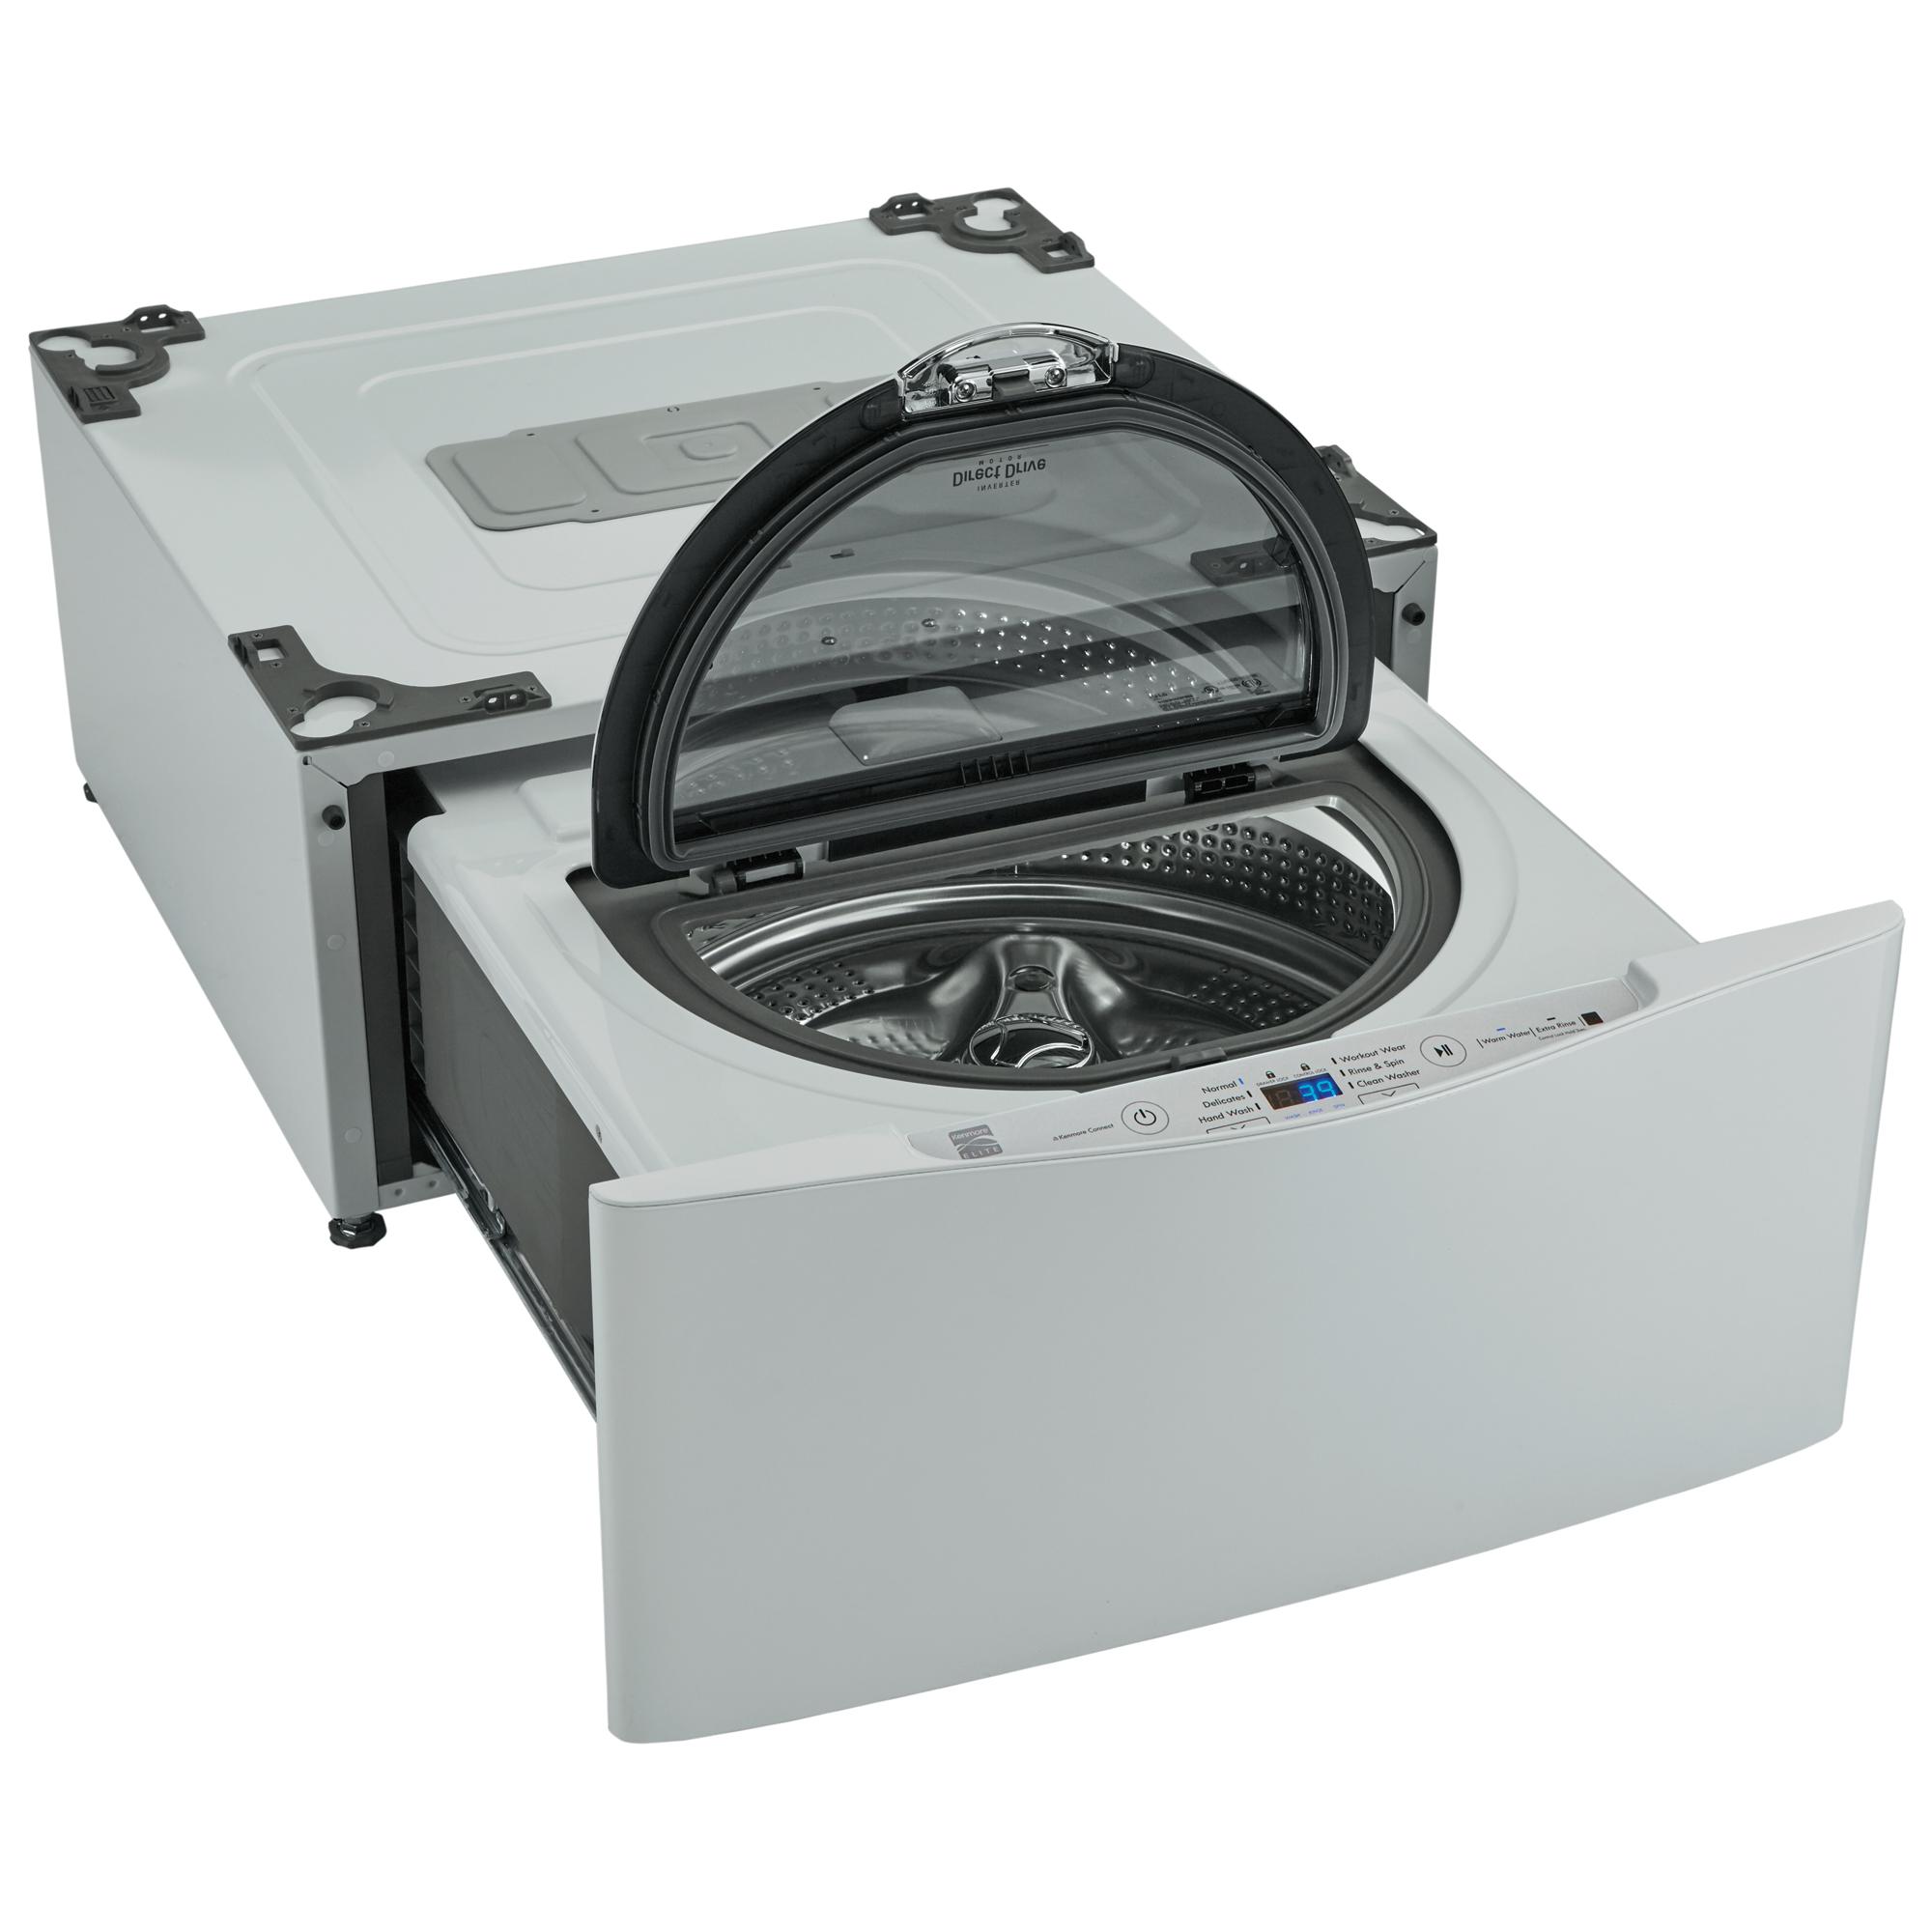 Wd100cw Sidekick Pedestal Washer Part Of The Lg Twin Wash System White Sears Tiny House Design Kenmore Elite Mini Washing Machine